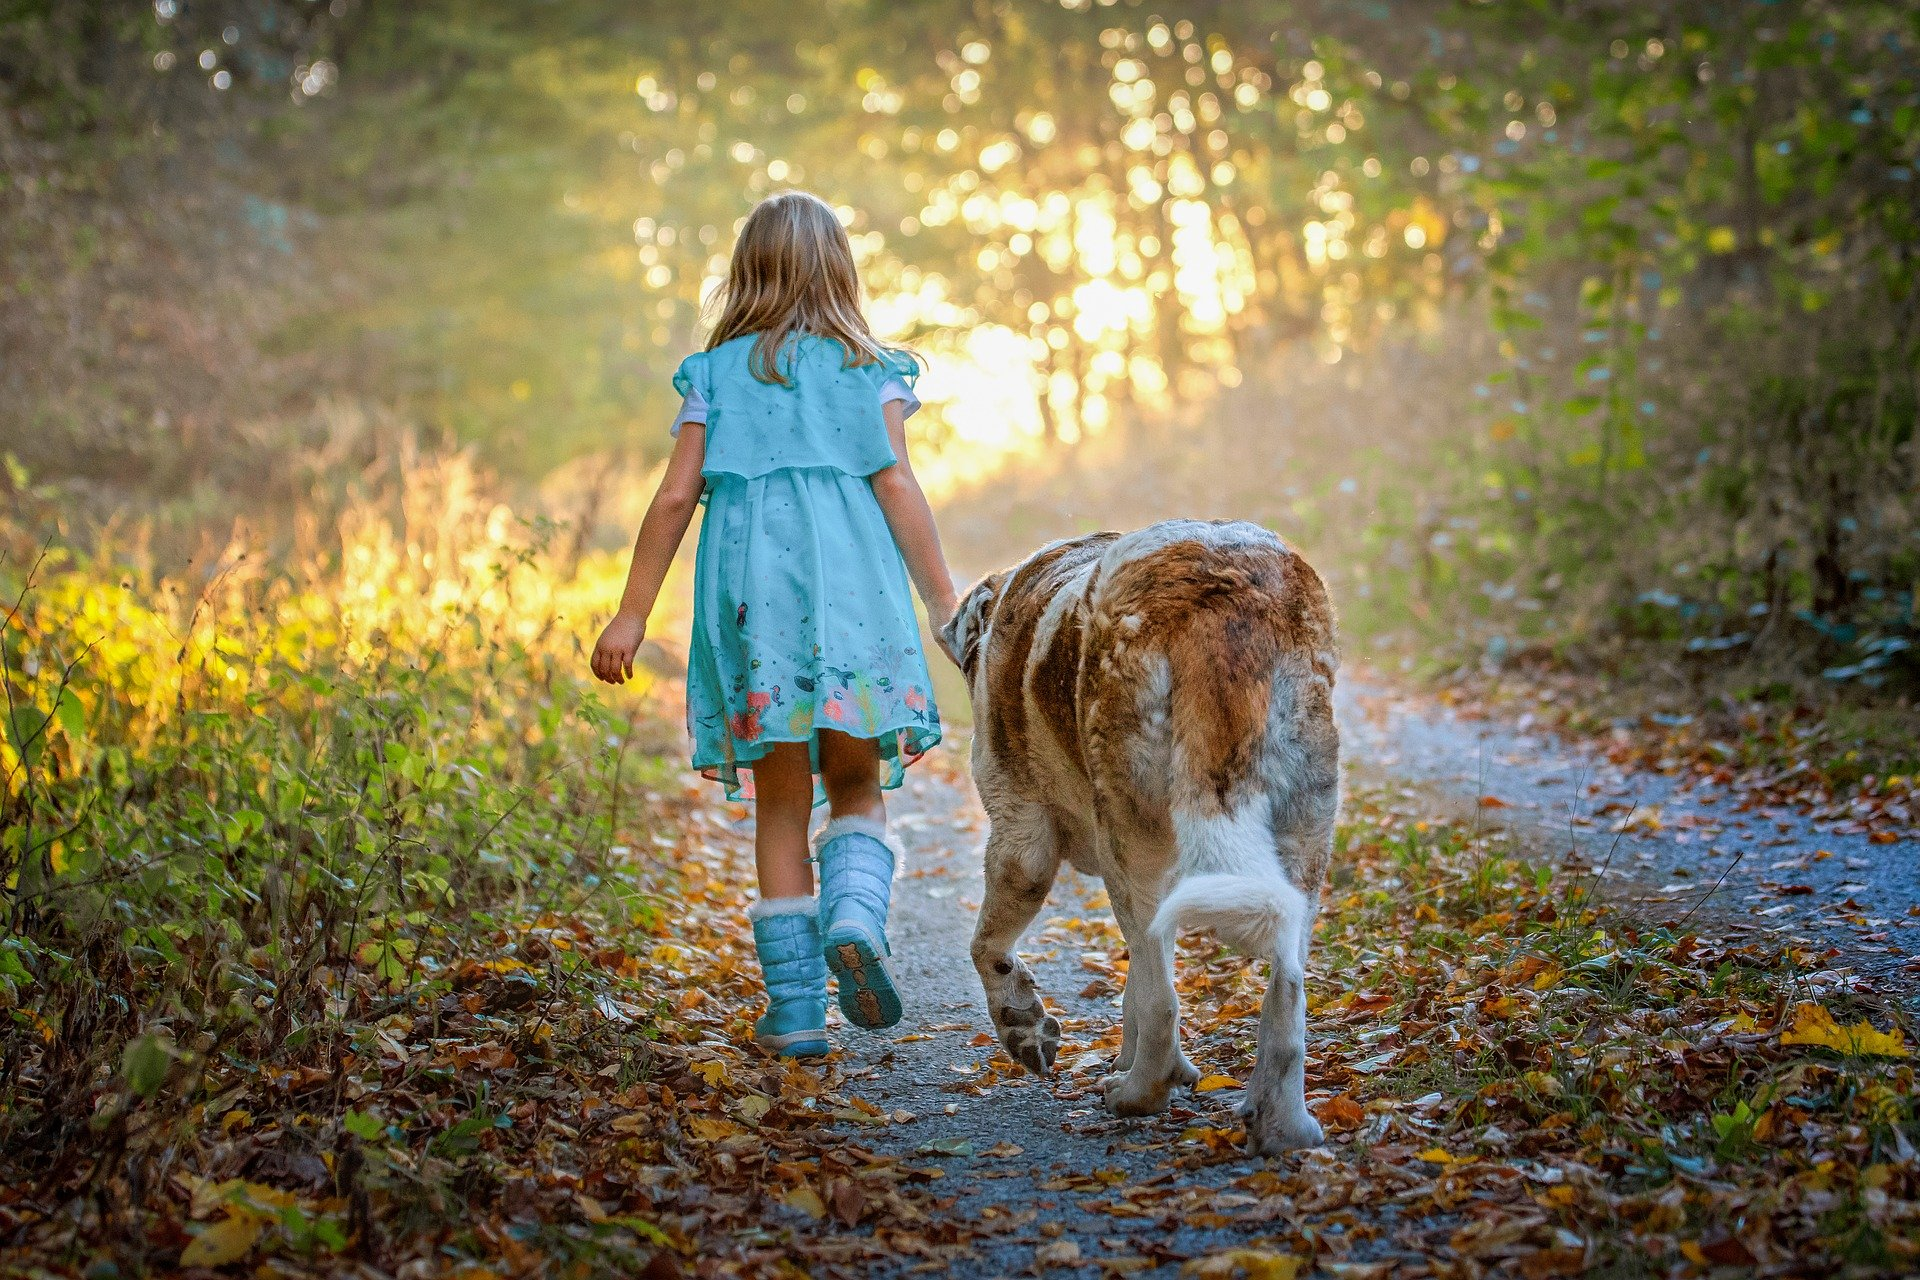 approcher un chien inconnu